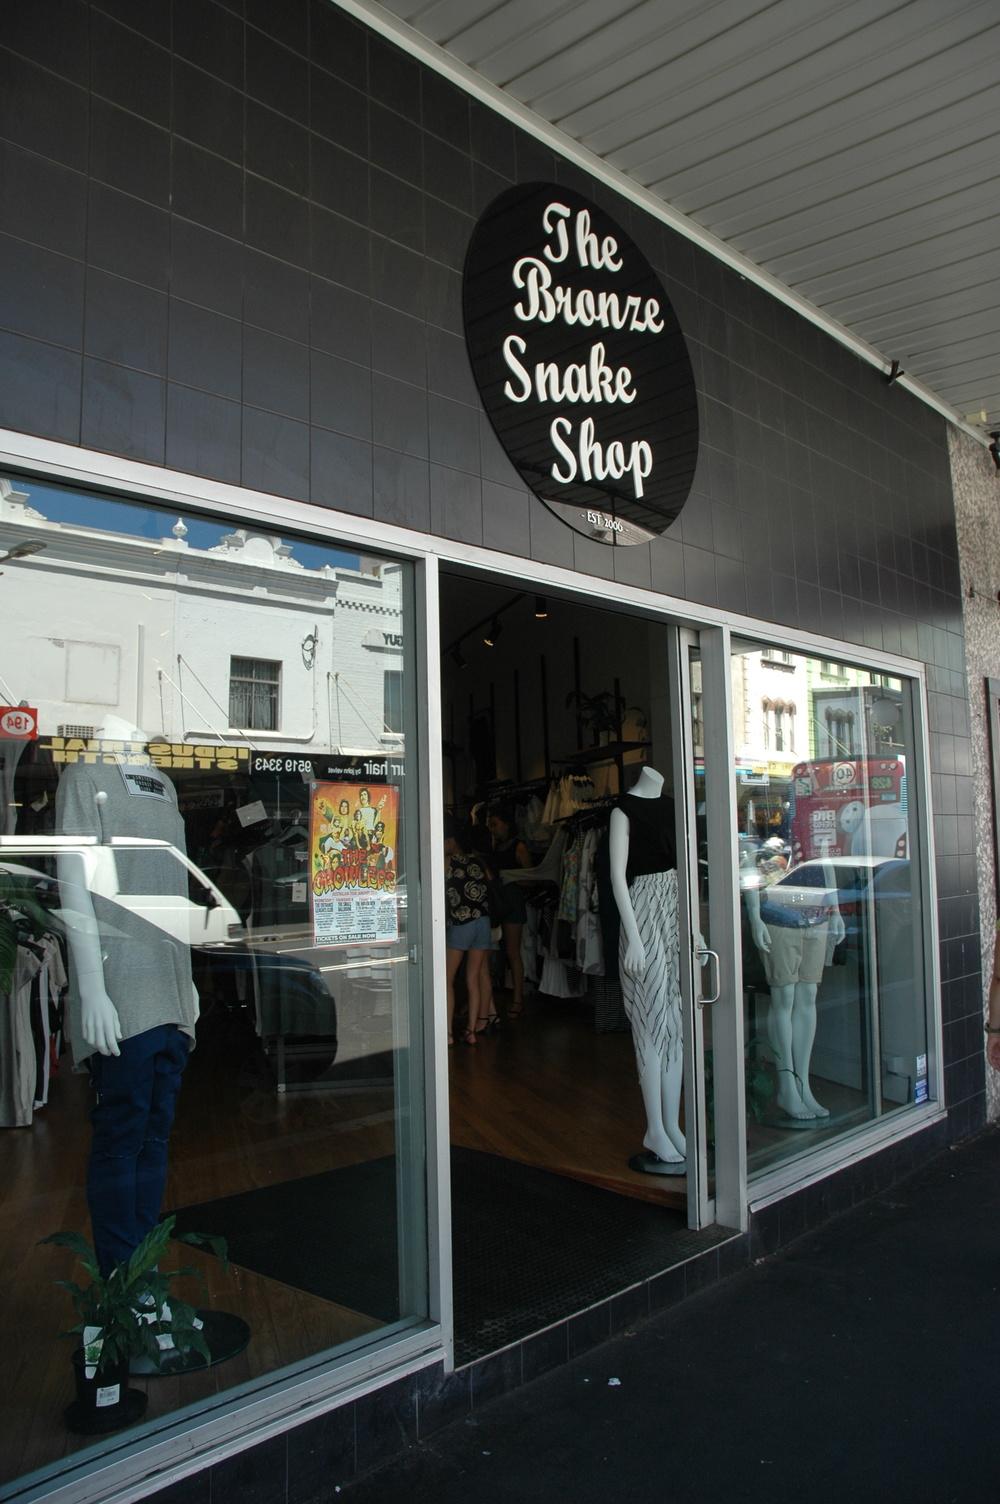 The Bronze Snake Shop - Shopping in Sydney Australia